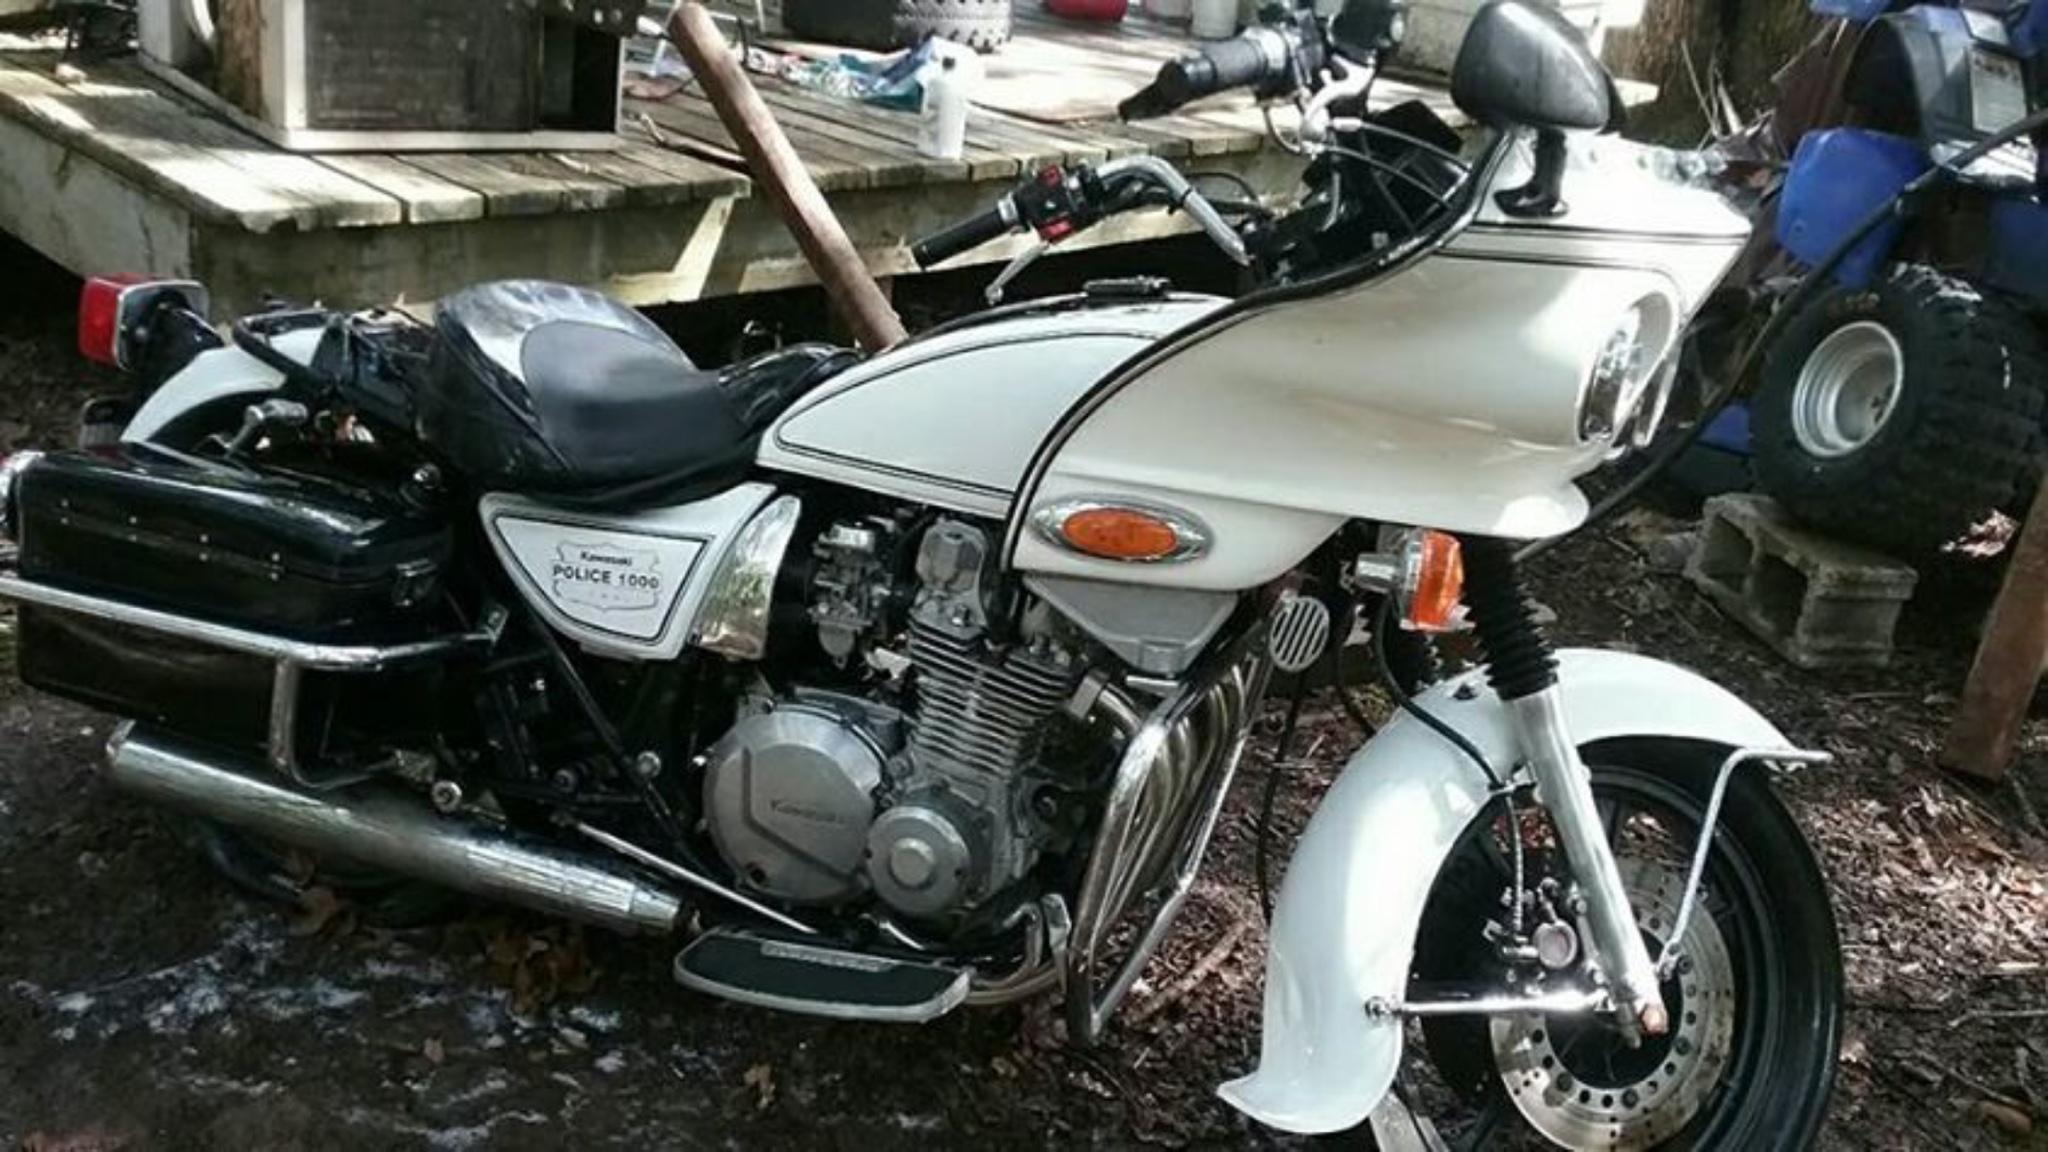 98 kz1000 Police or 77 kz650c? - Kawasaki Motorcycle Forums